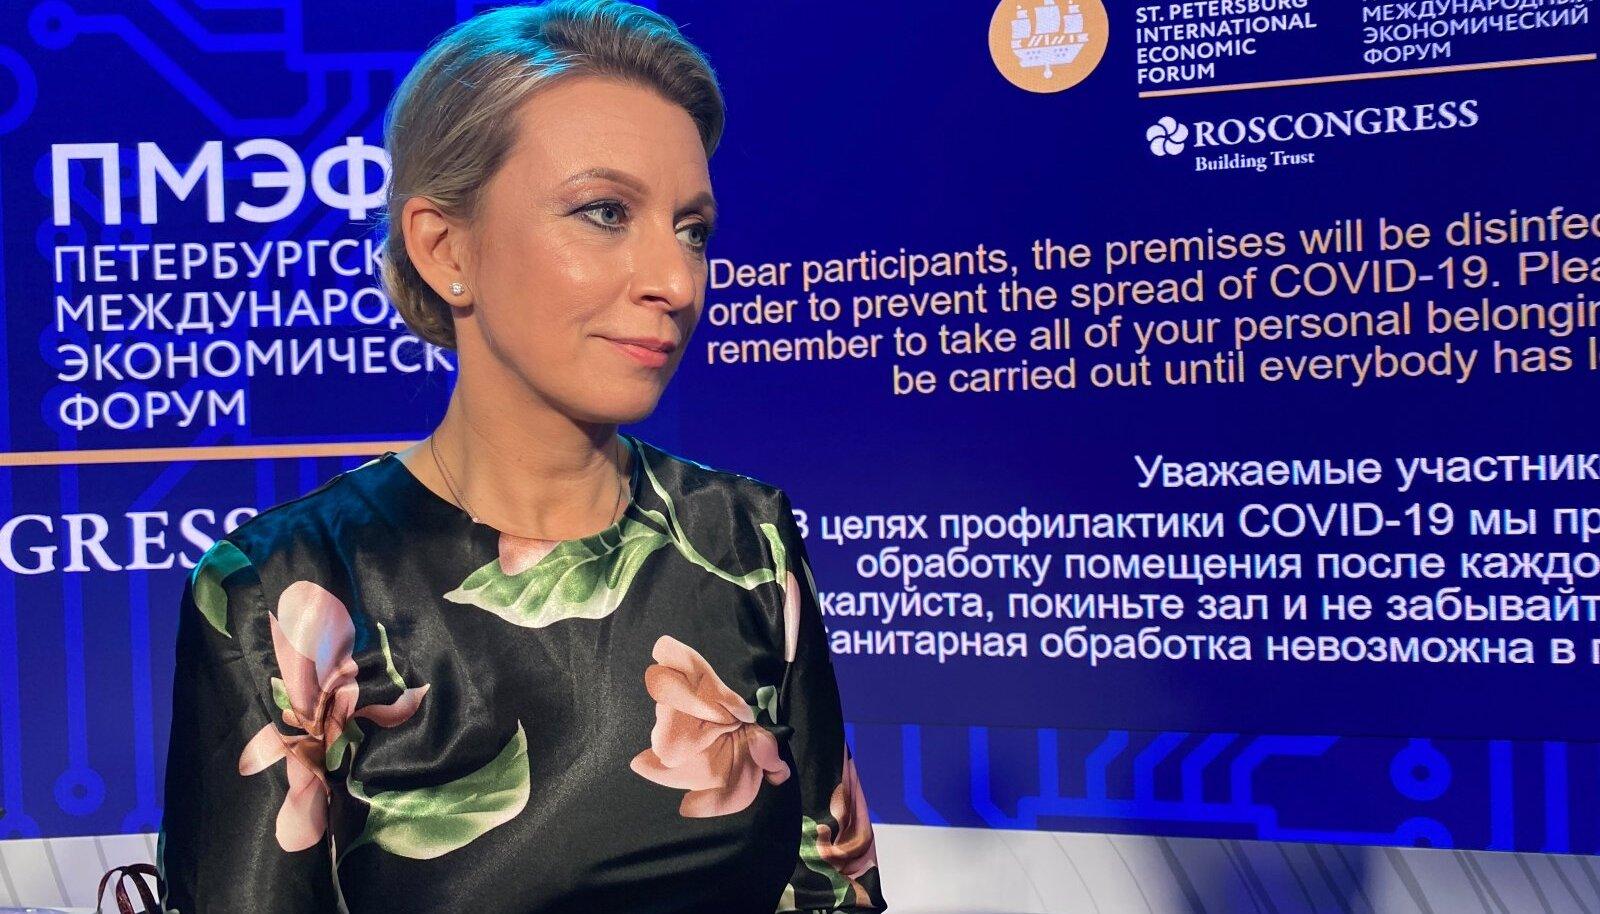 Marija Zahharova